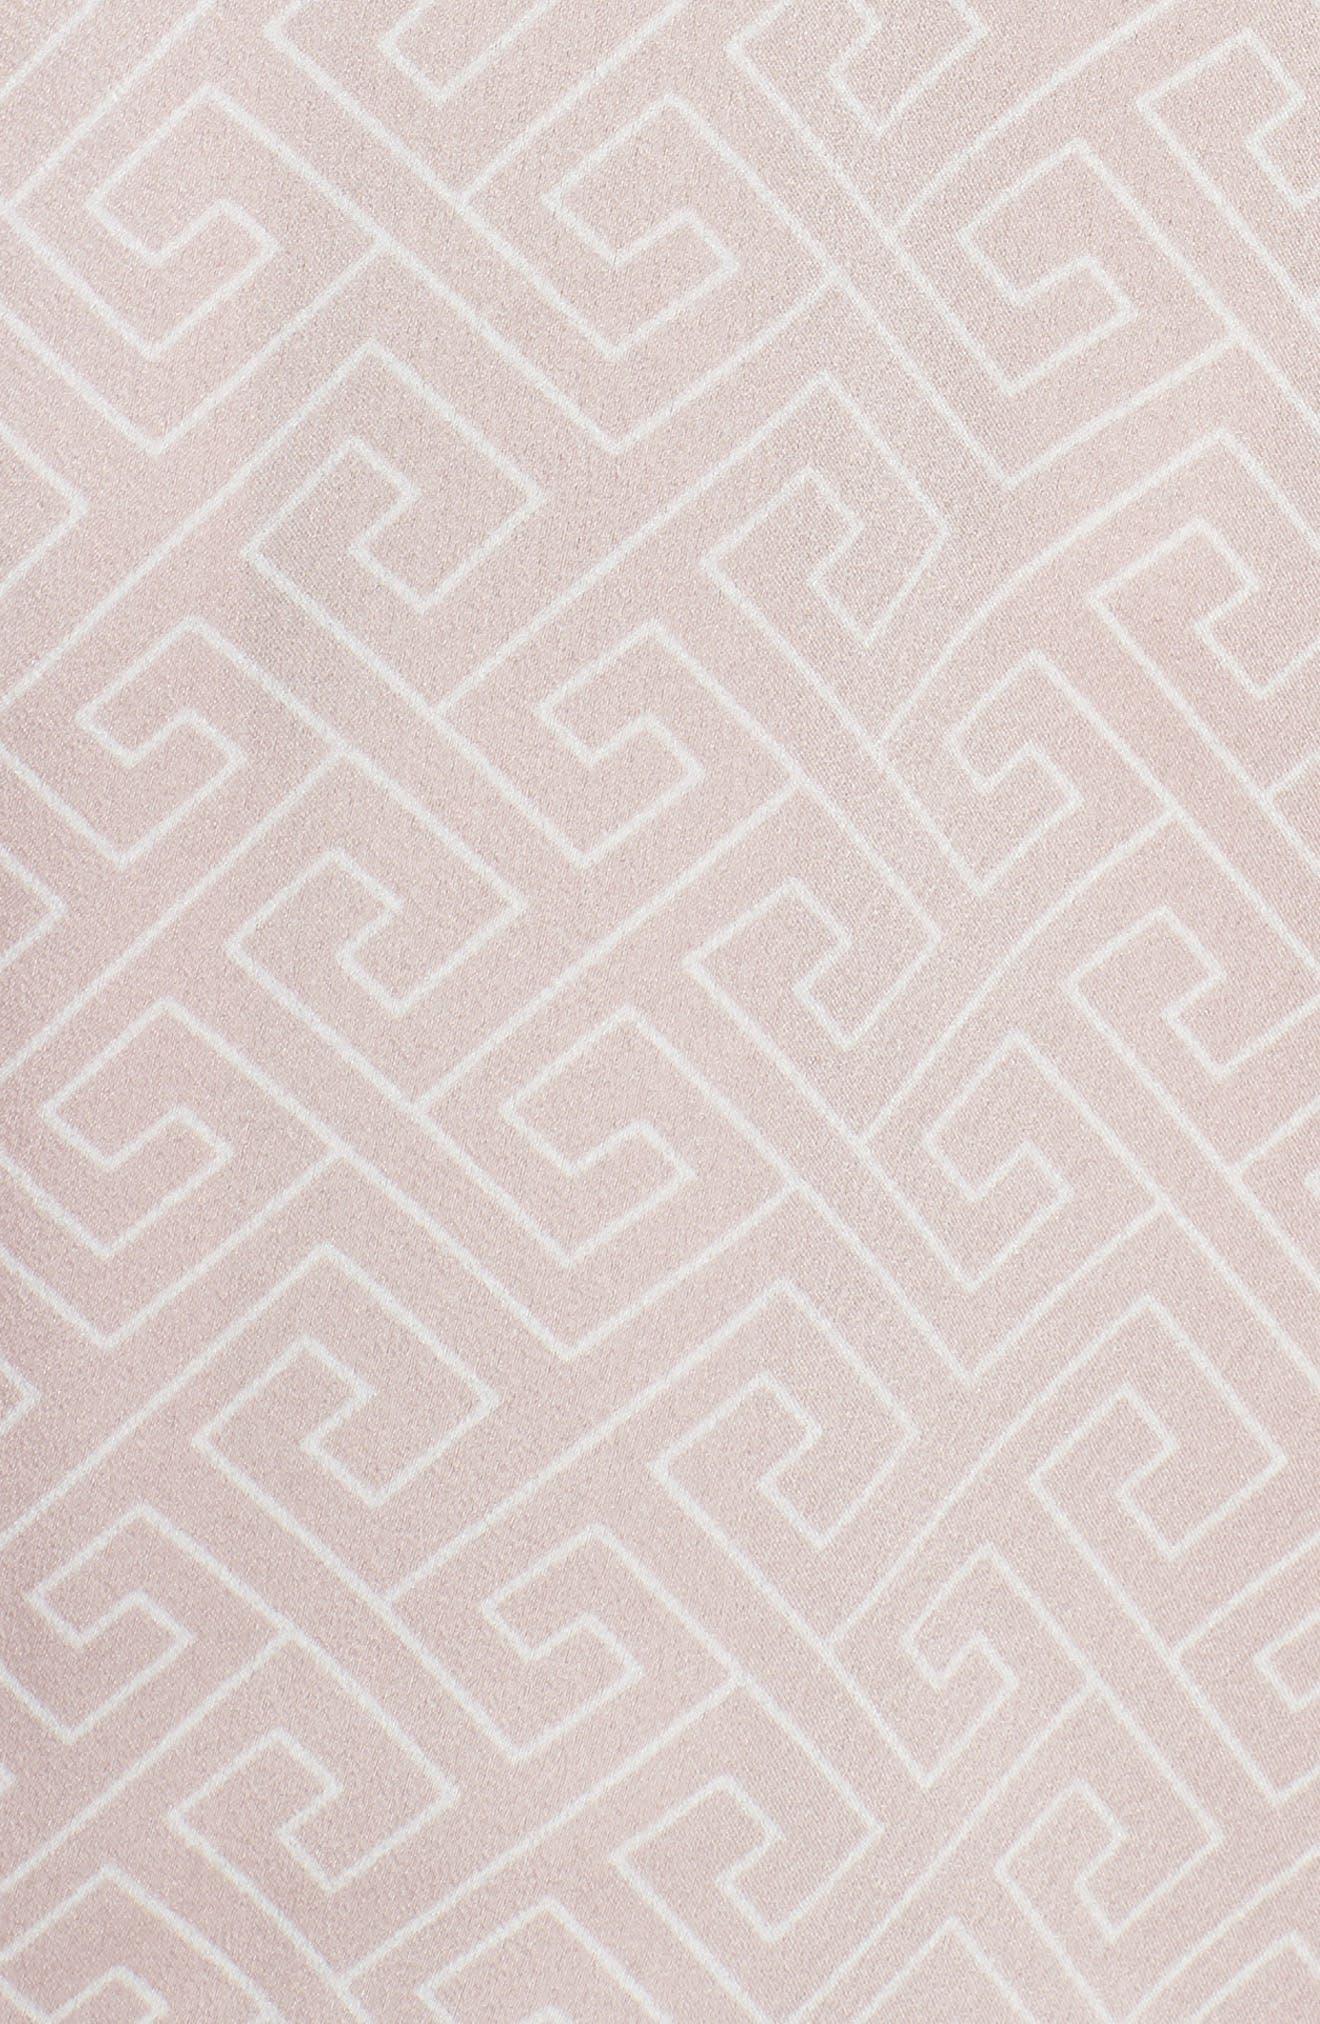 Labyrinth Satin Pajamas,                             Alternate thumbnail 5, color,                             Rose Beige